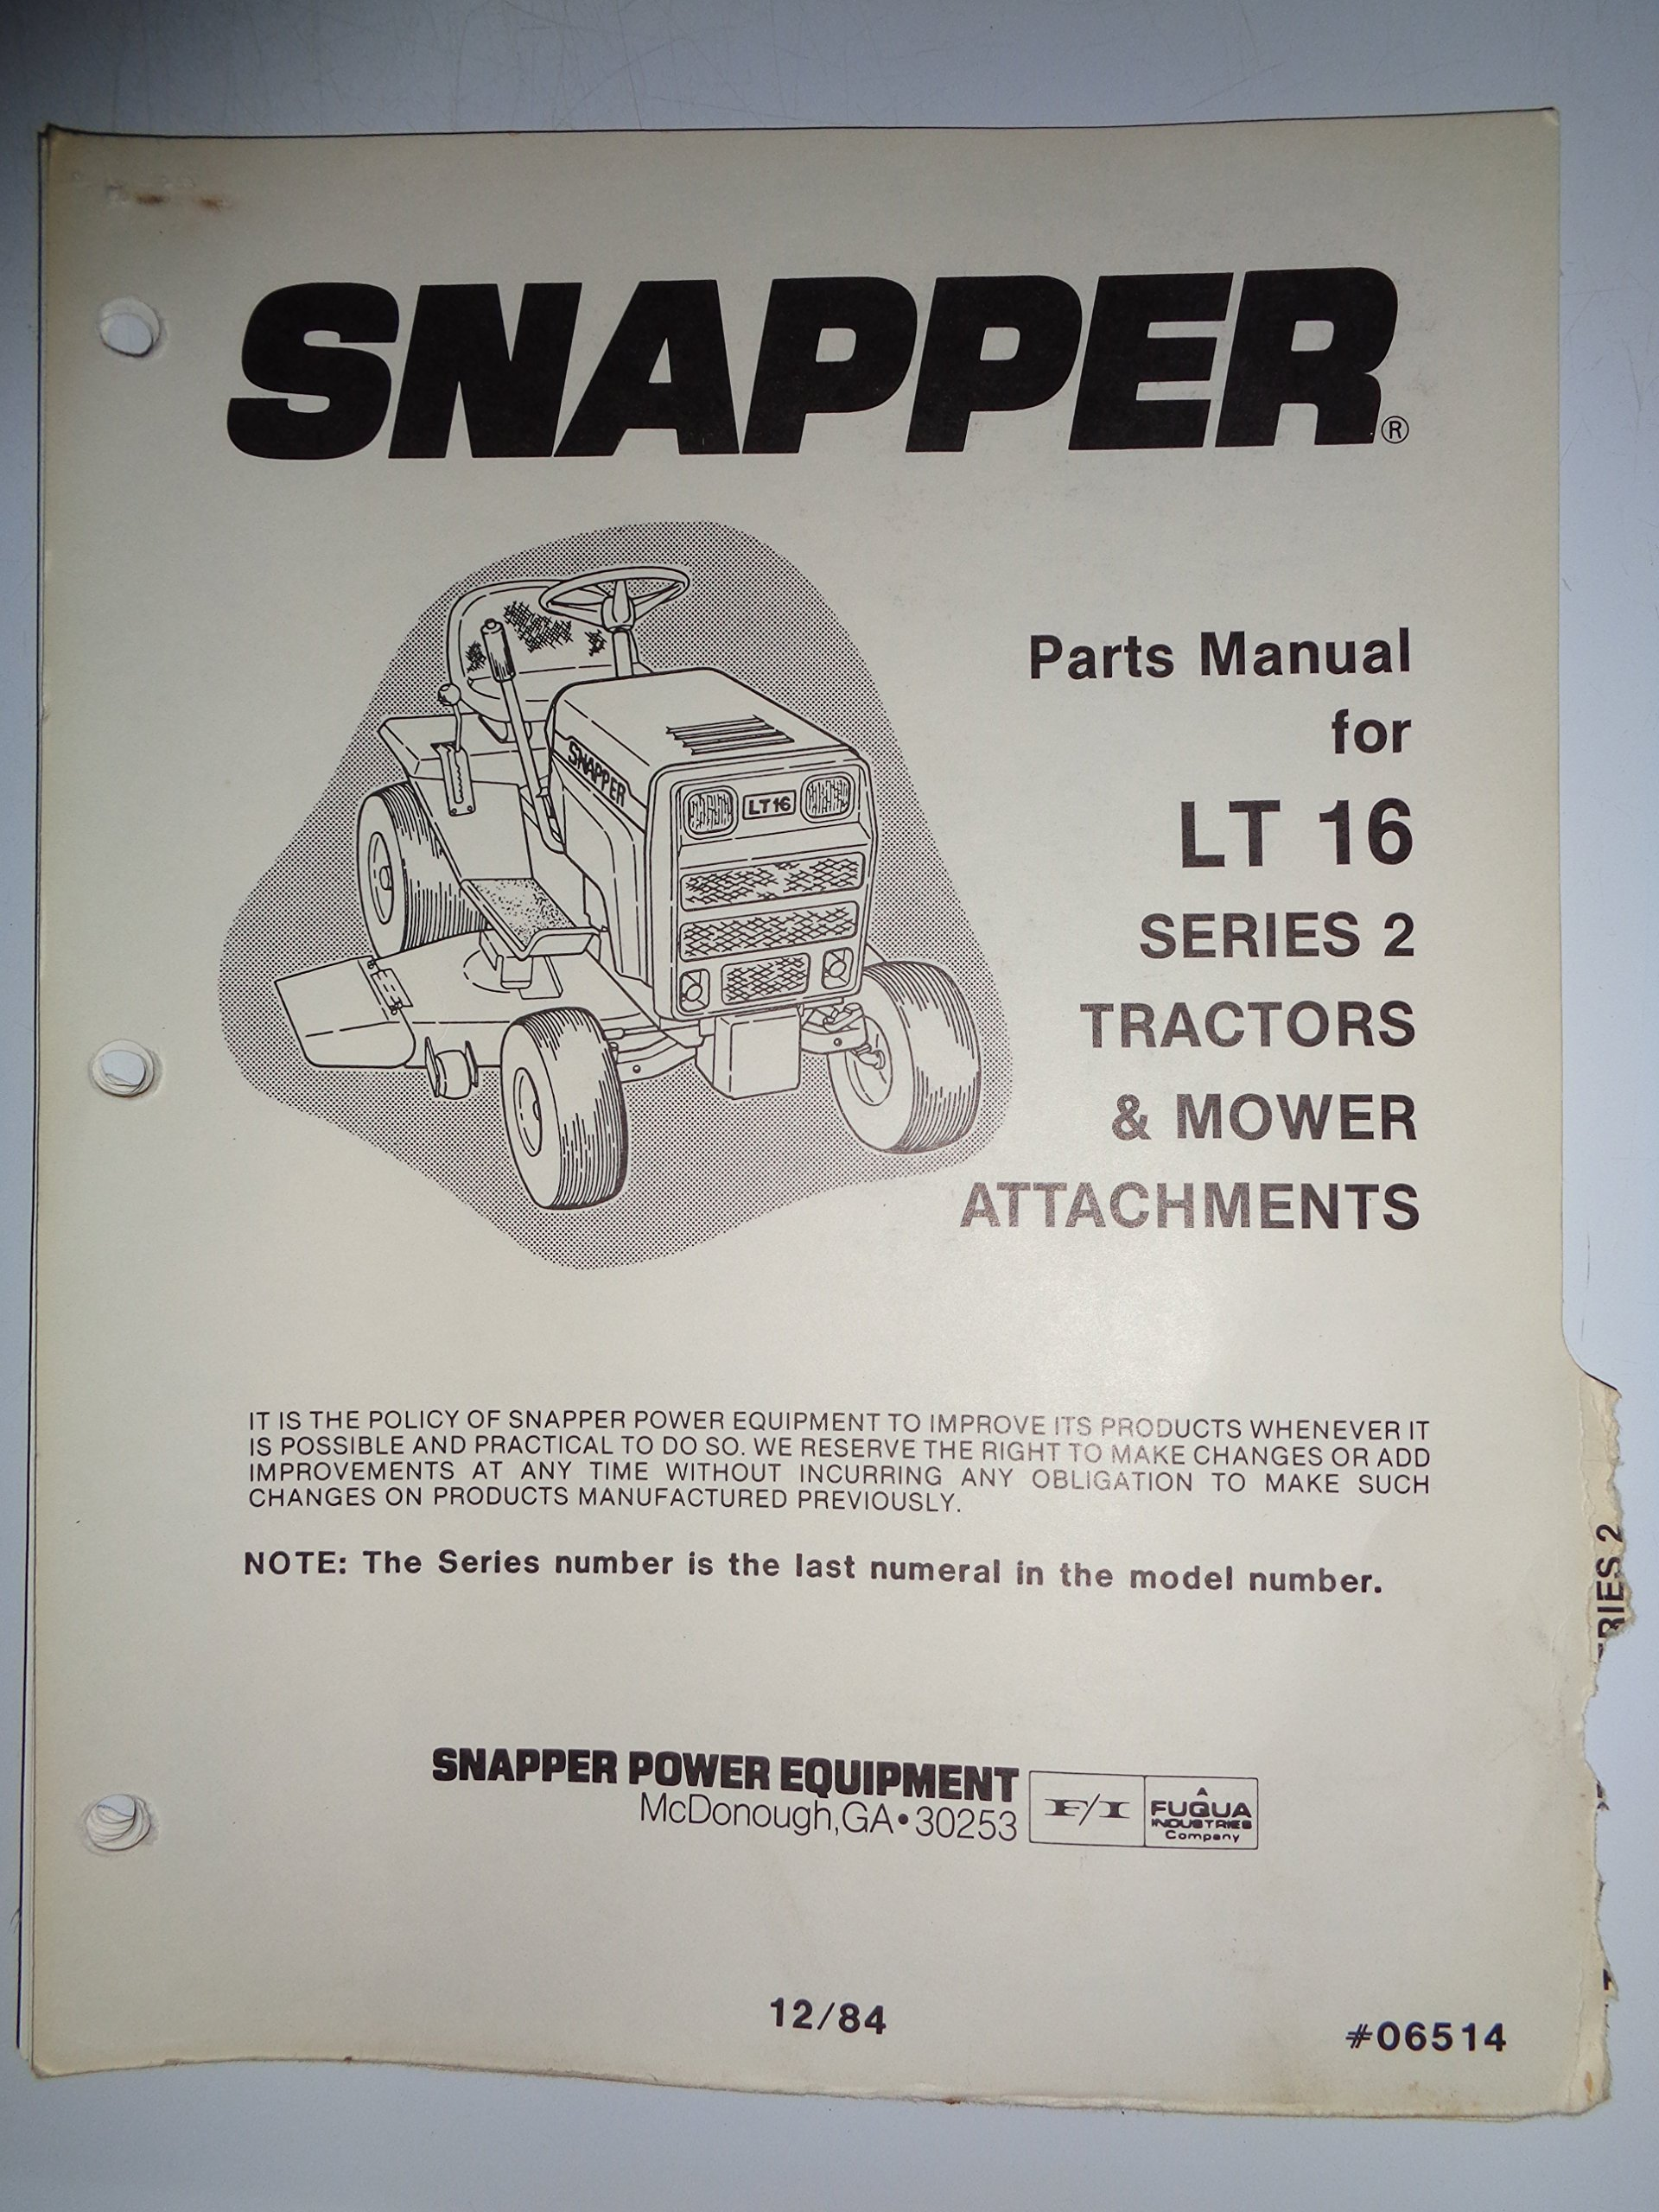 snapper series 2 model lt16 lawn garden tractor parts catalog book rh amazon com snapper lt16 owners manual Snapper LT 16 Parts Manual